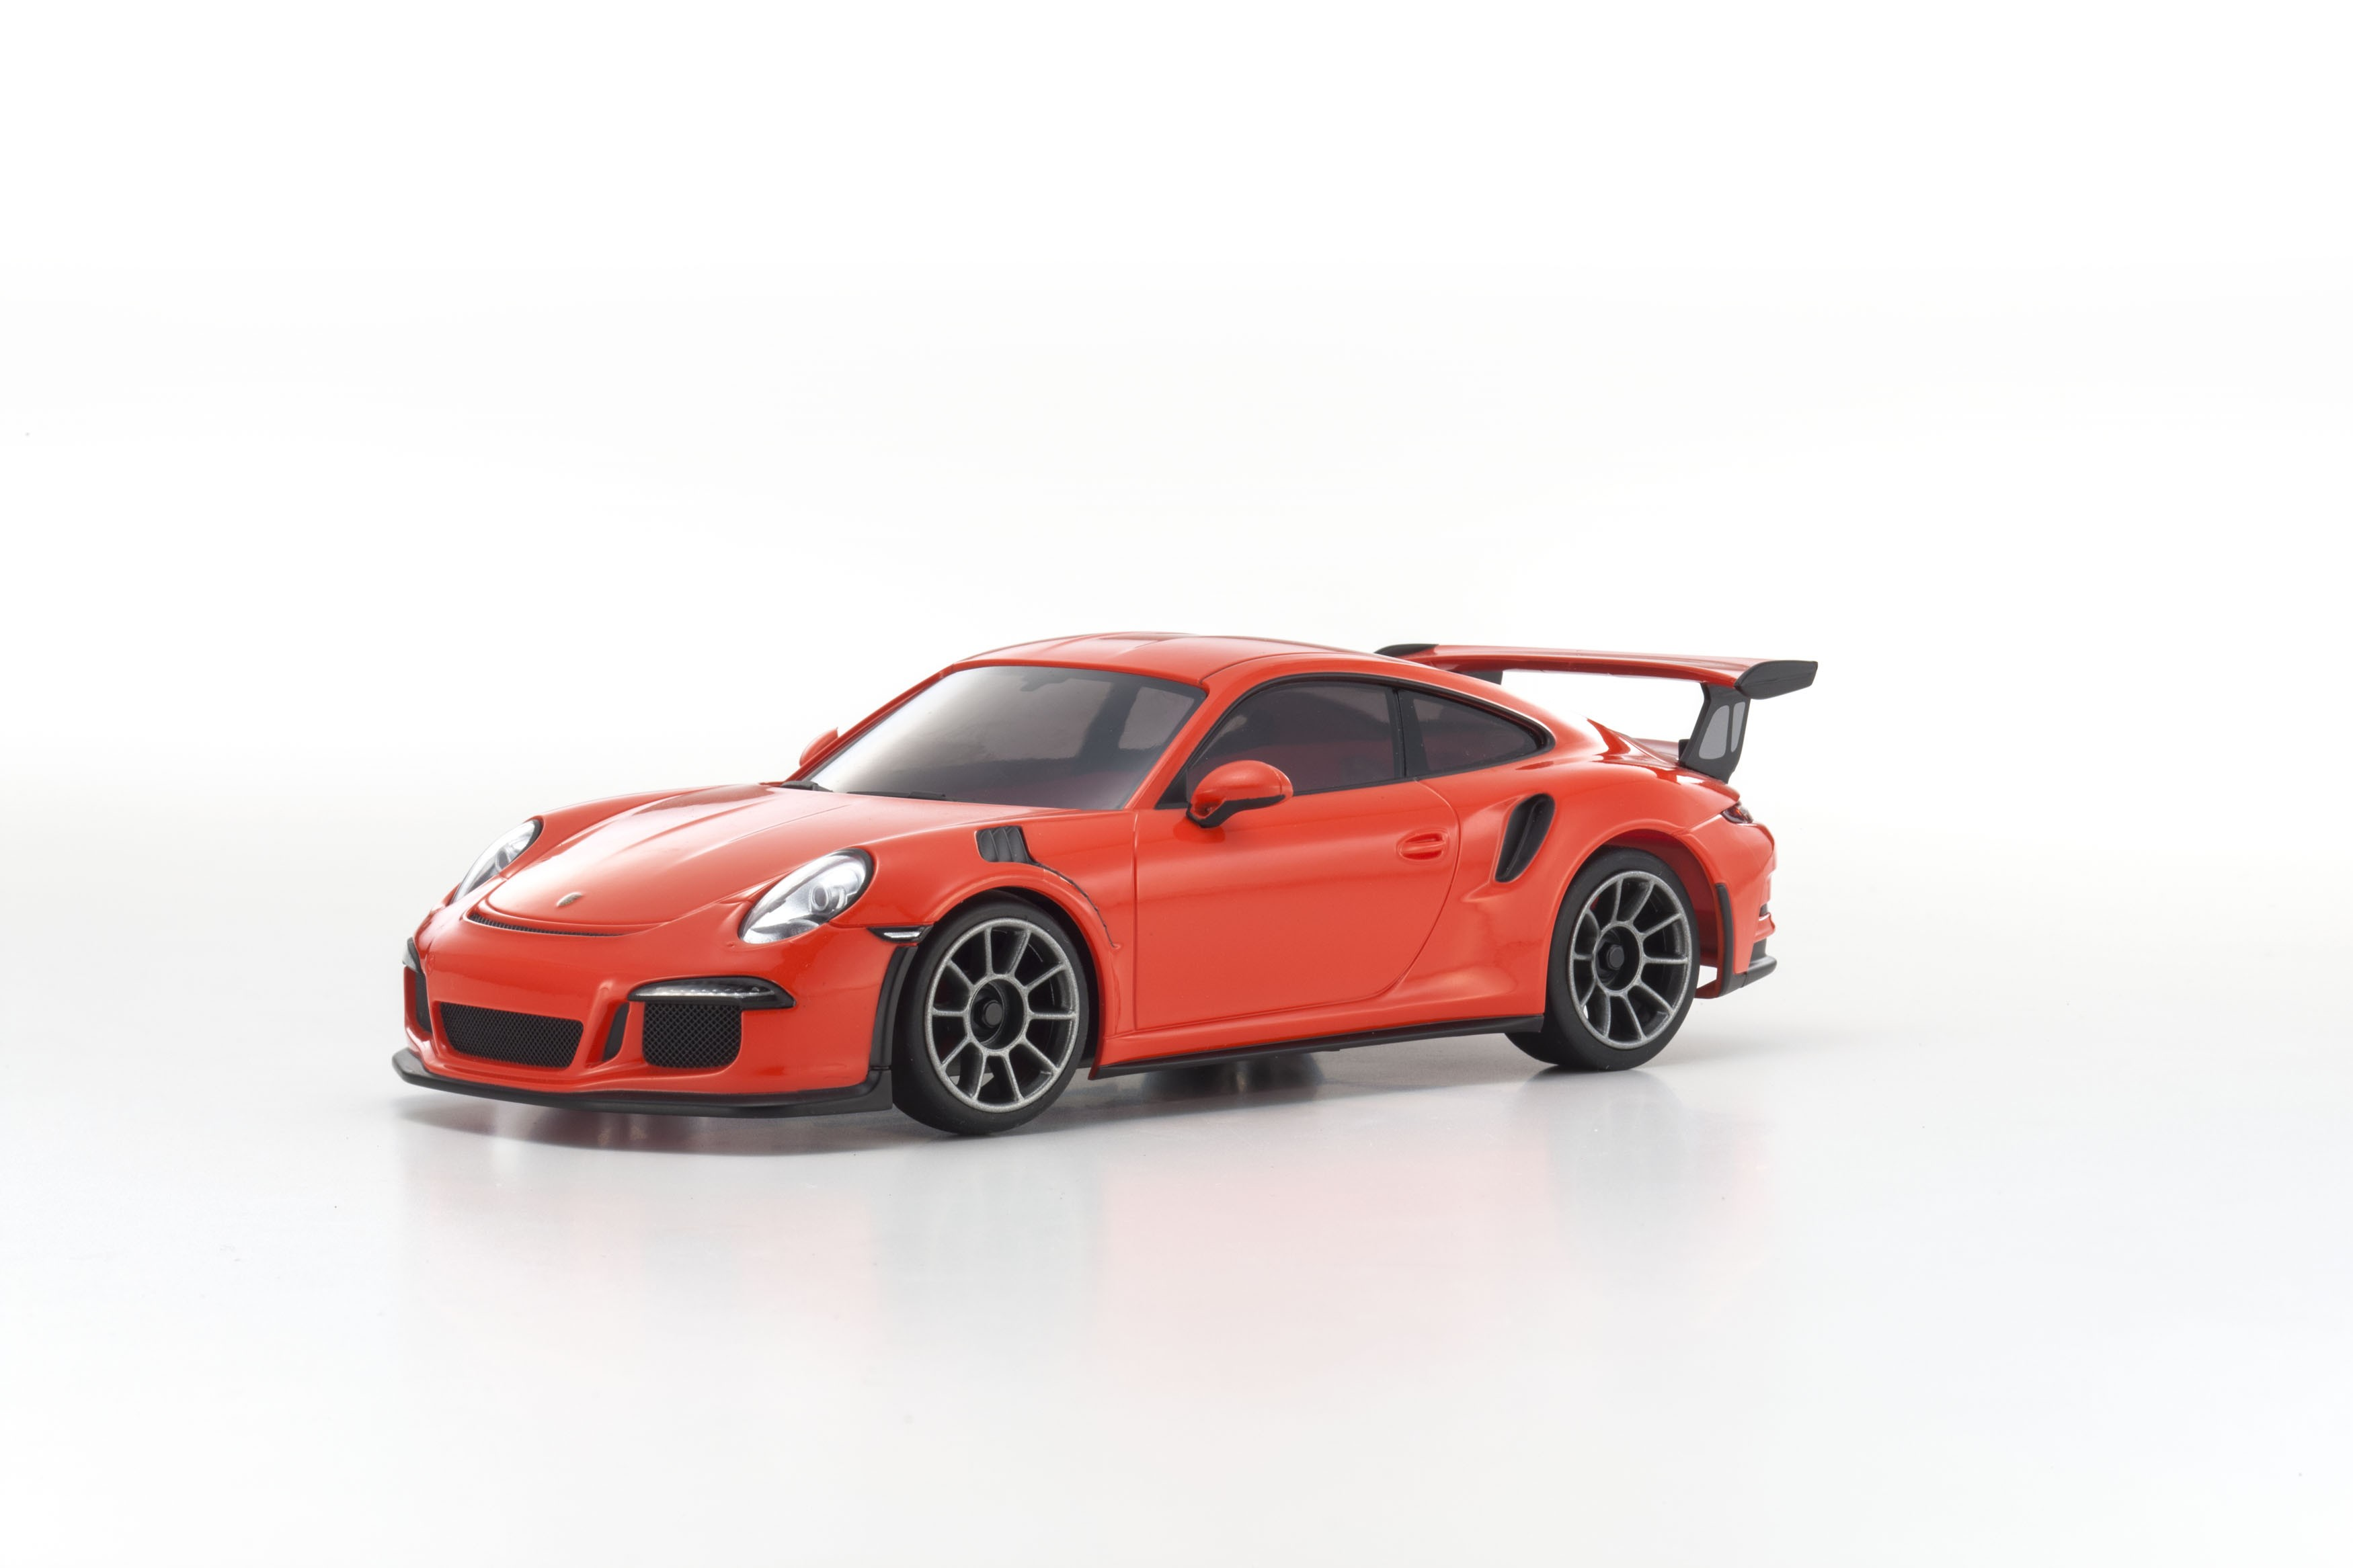 koyosho miniz mr03 sports 2 porsche 911 gt3 rs orange n rm kt19. Black Bedroom Furniture Sets. Home Design Ideas